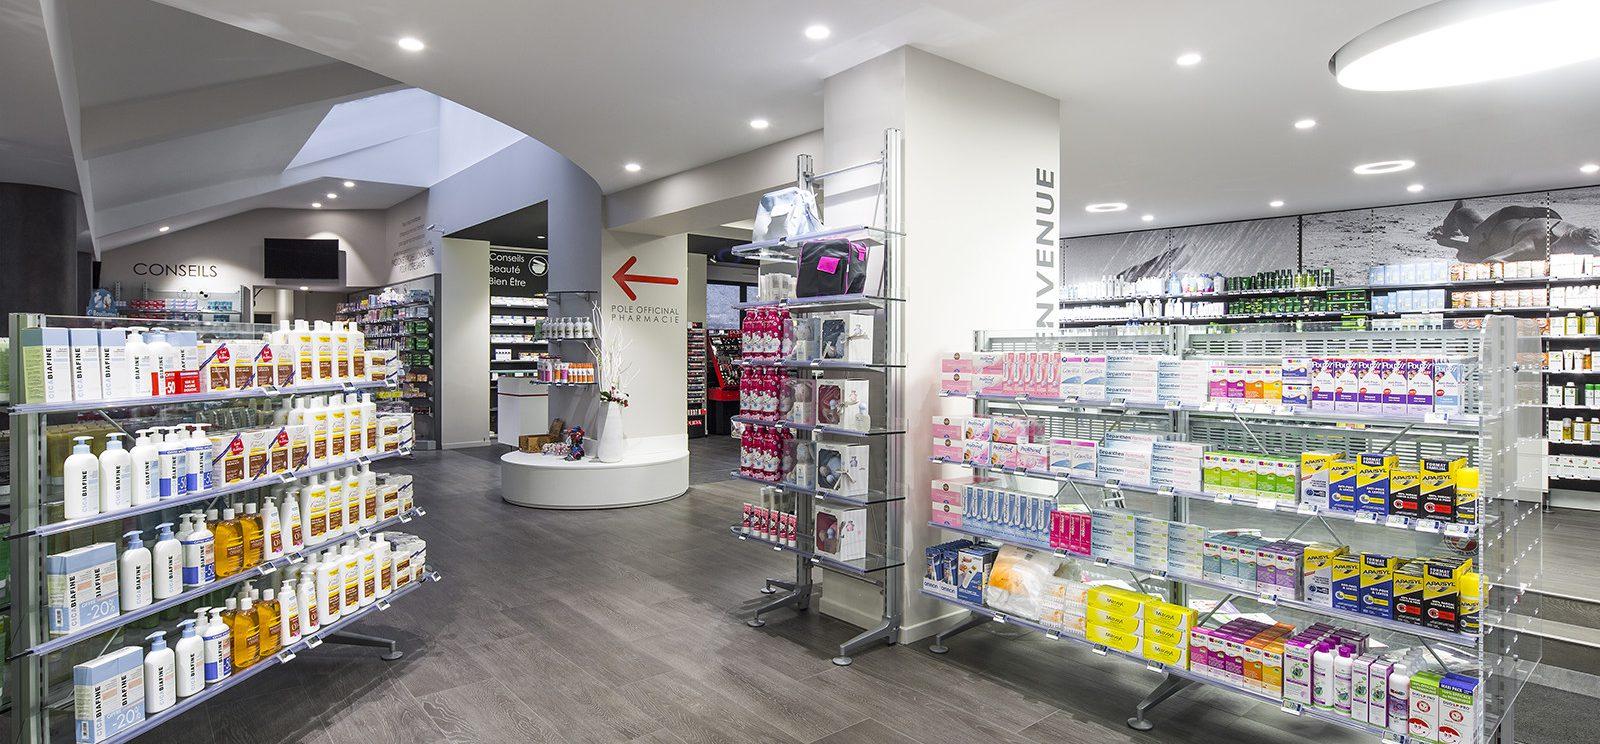 Pharmacie badoc realizzazioni th kohl for Kohl arredamenti farmacie